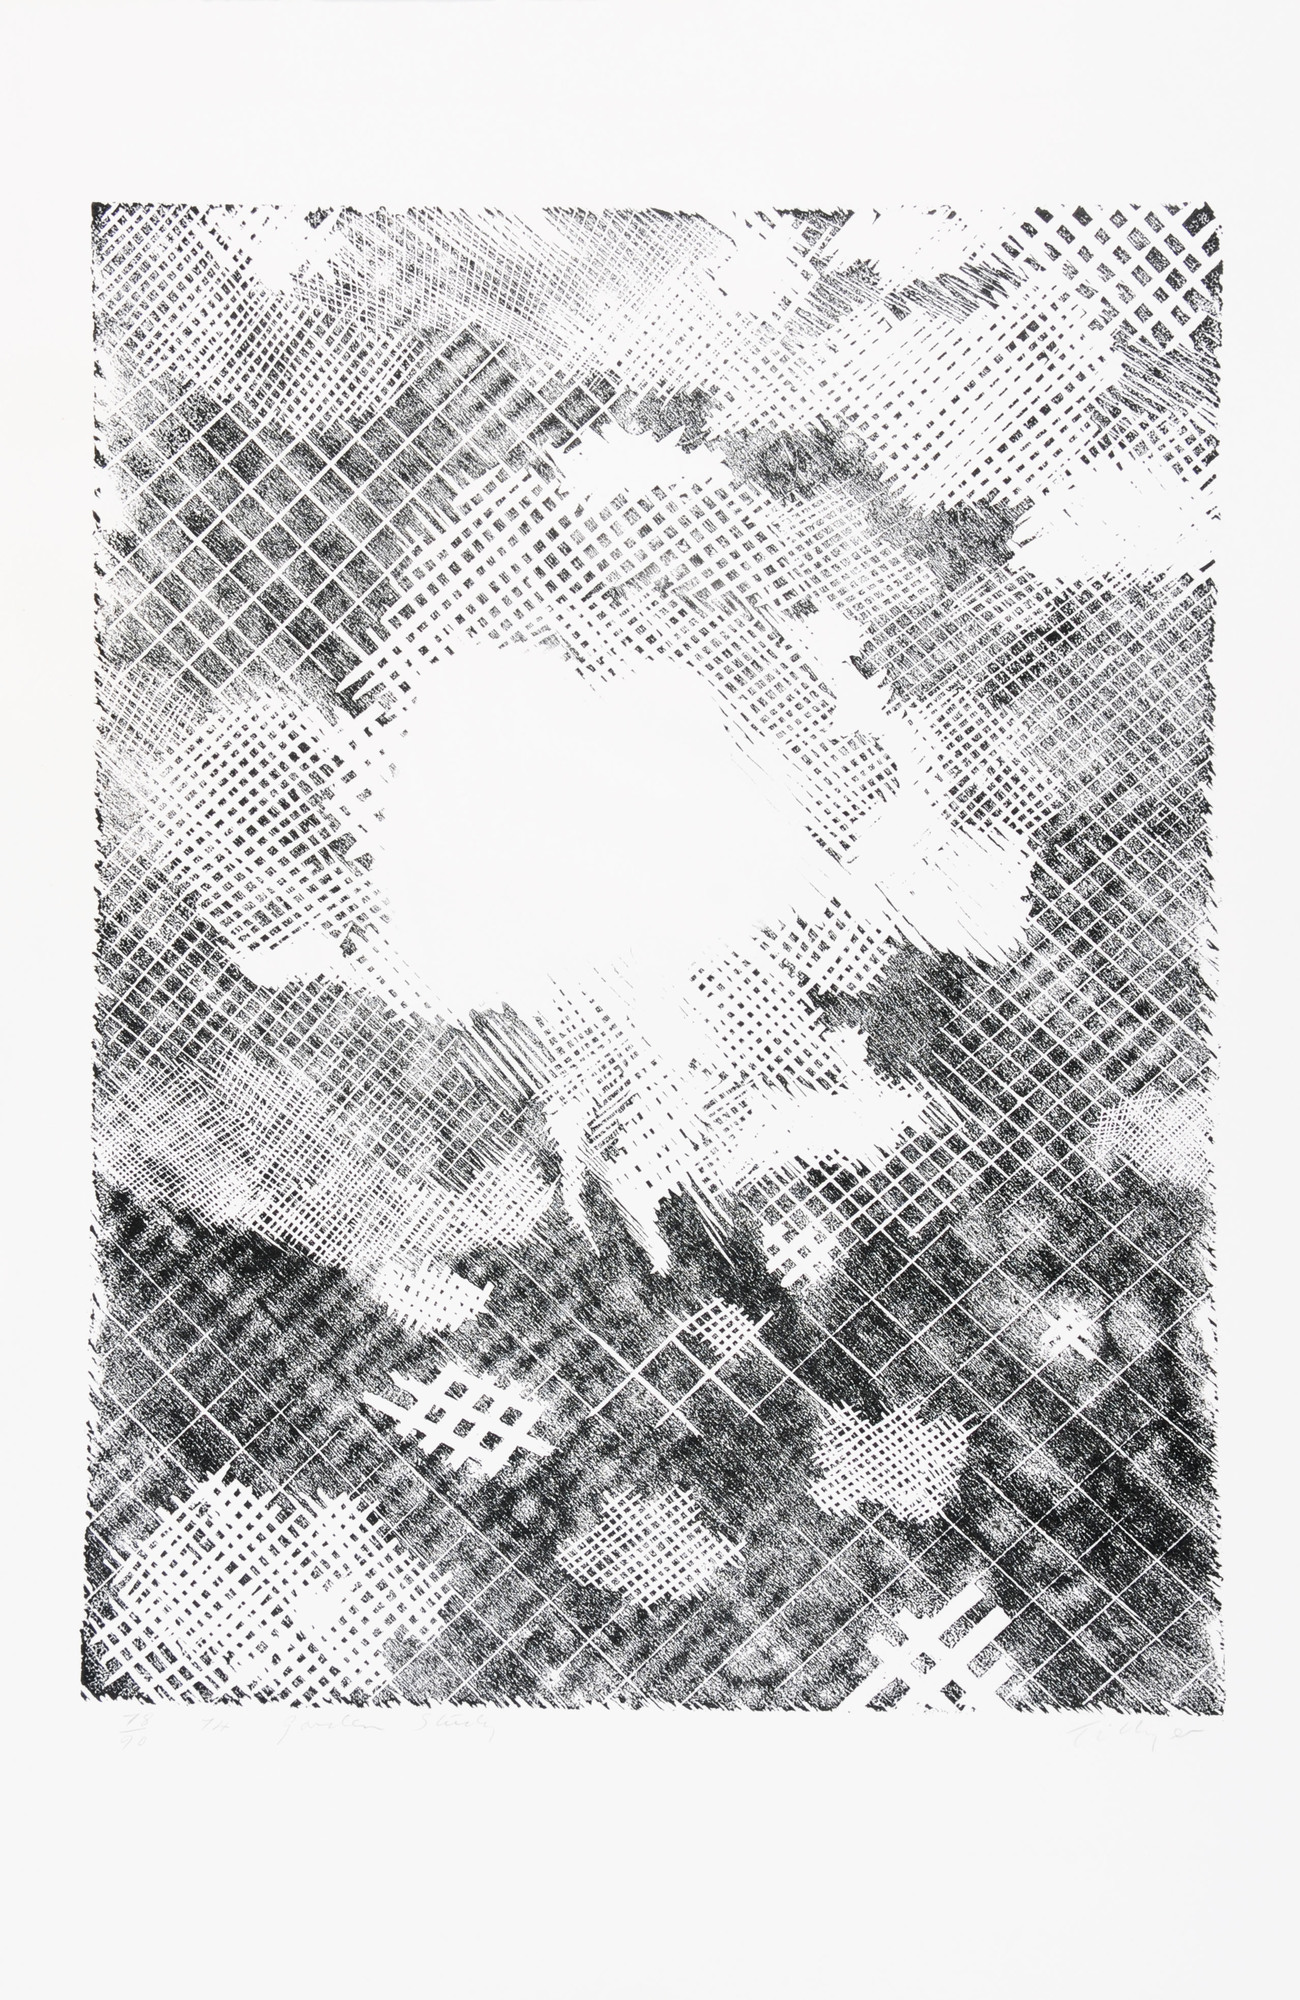 Grafik, 11 Blätter: G. Le Roy; D. Kramer; J. Palm; P. Tuma; P. Courtin; R. Cottingham; W. Tillyer (5)